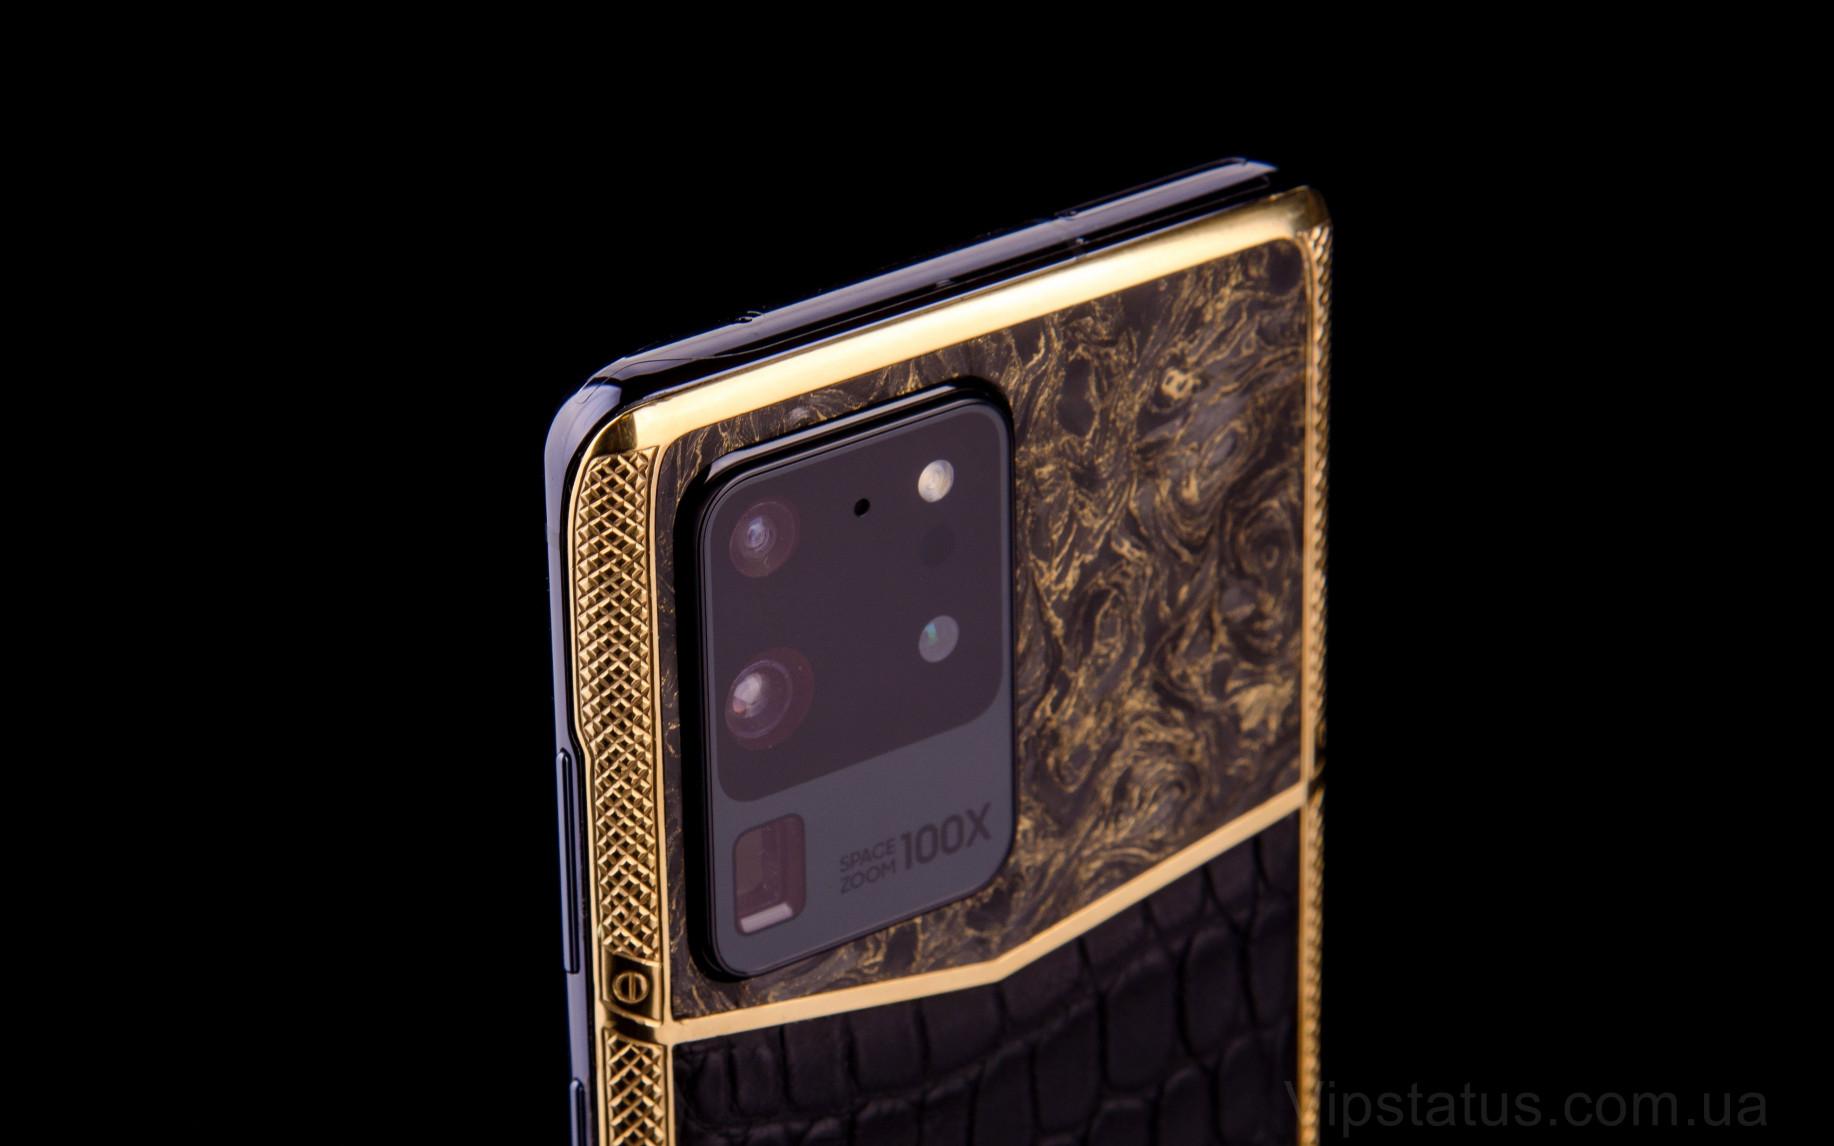 Elite Samsung S20 Gold Star Samsung S20 Gold Star image 2